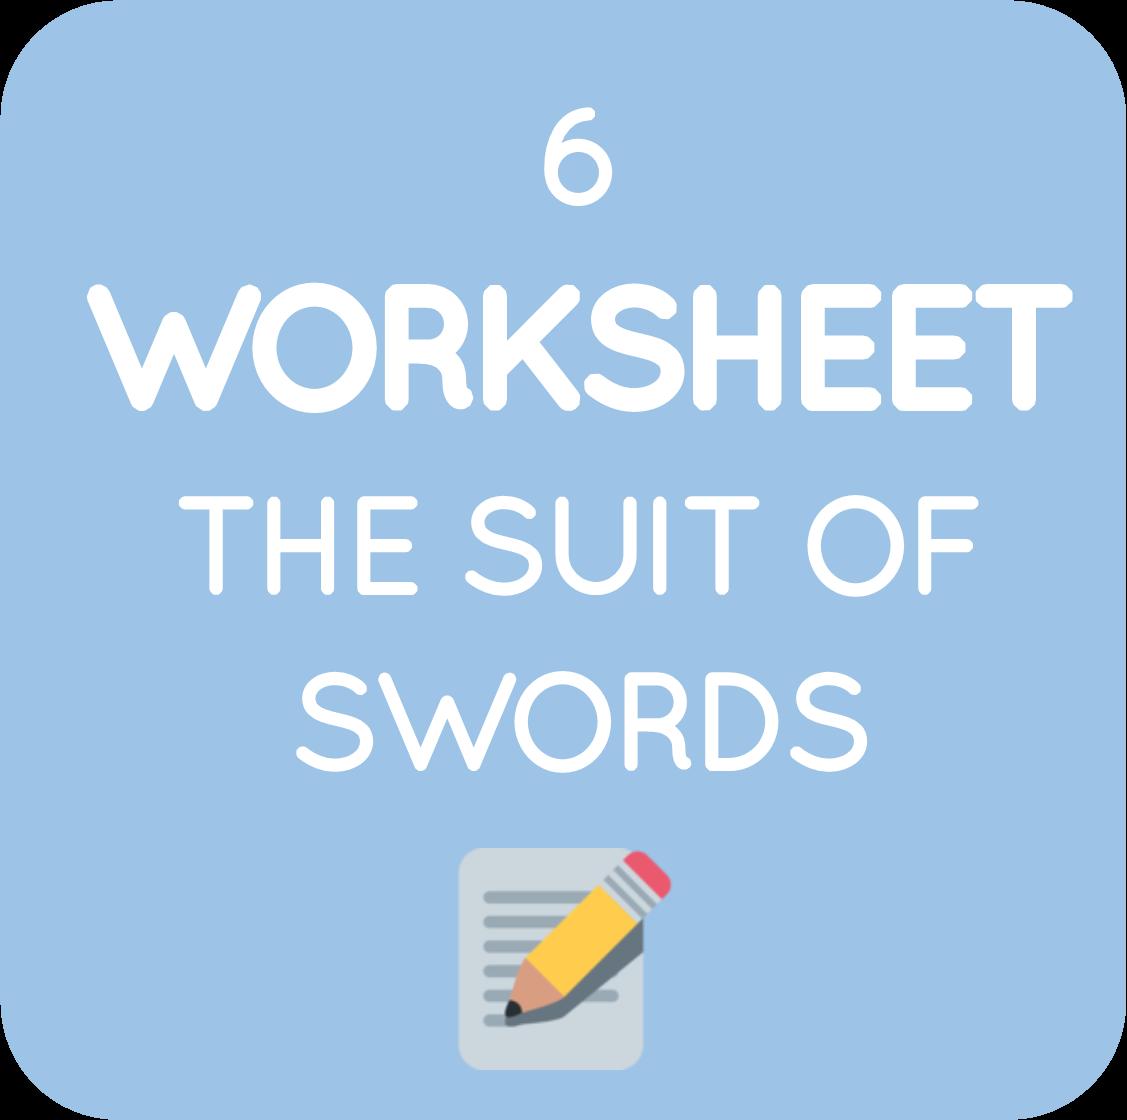 12-tarot worksheet #6.png